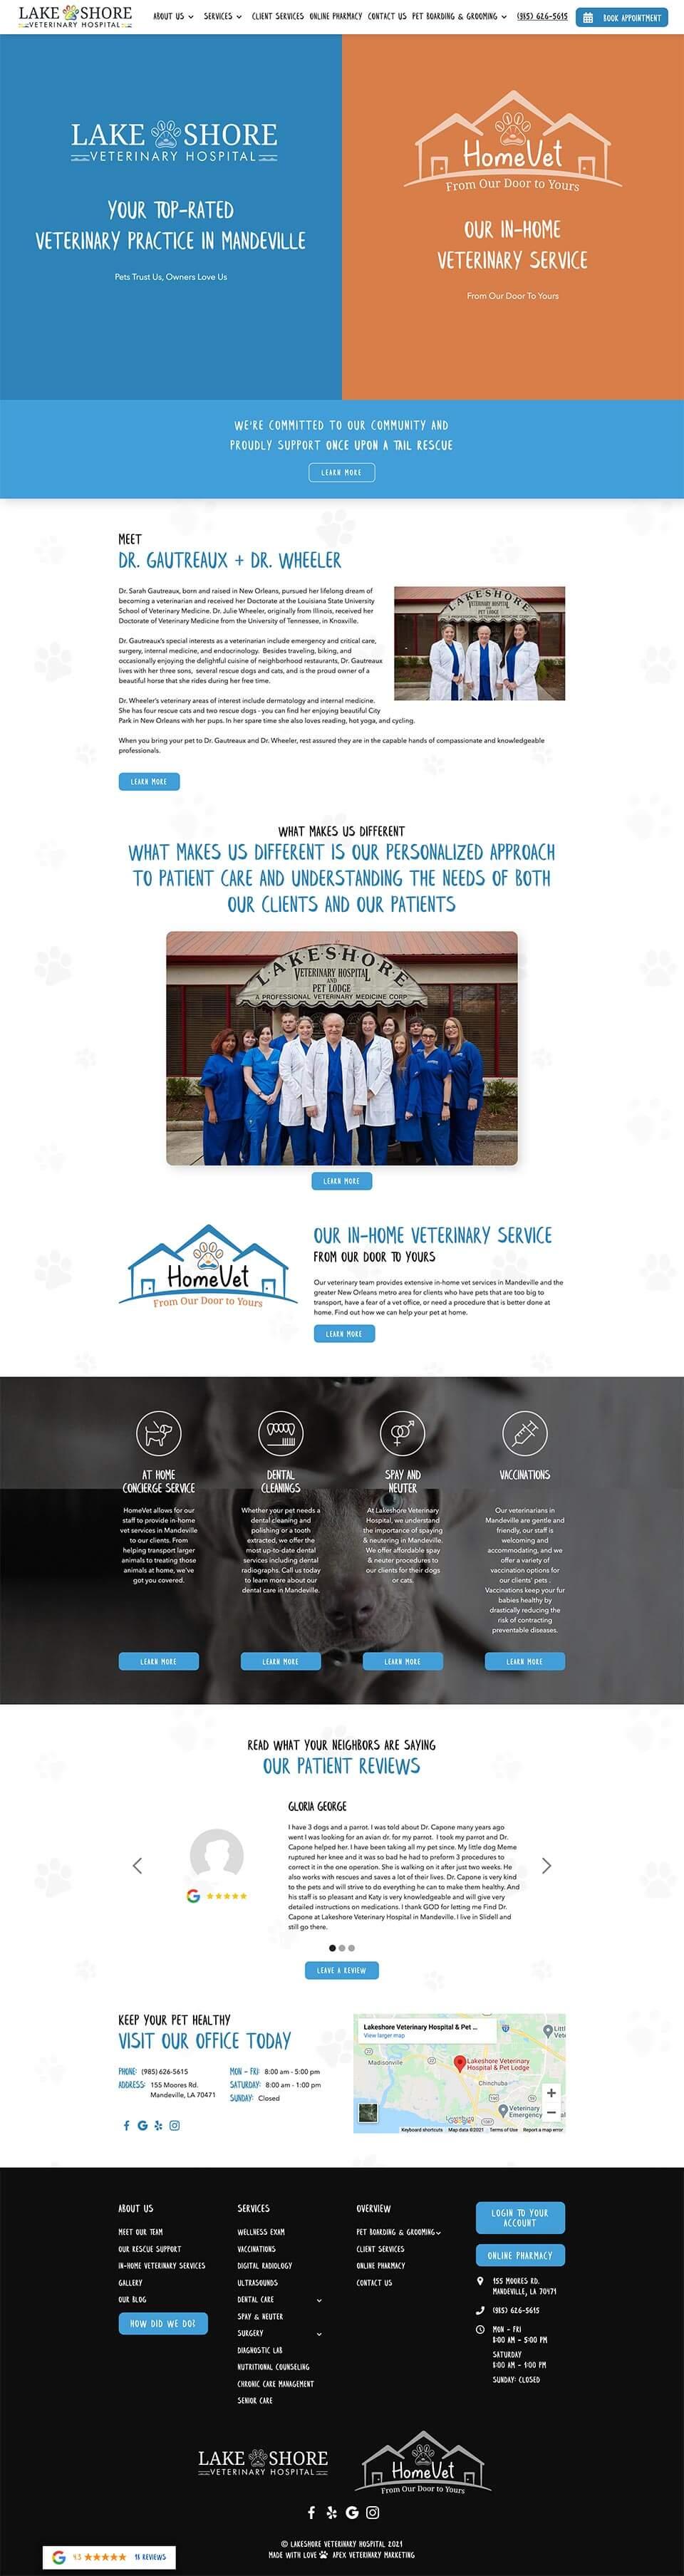 Lakeshore Veterinary Hospital